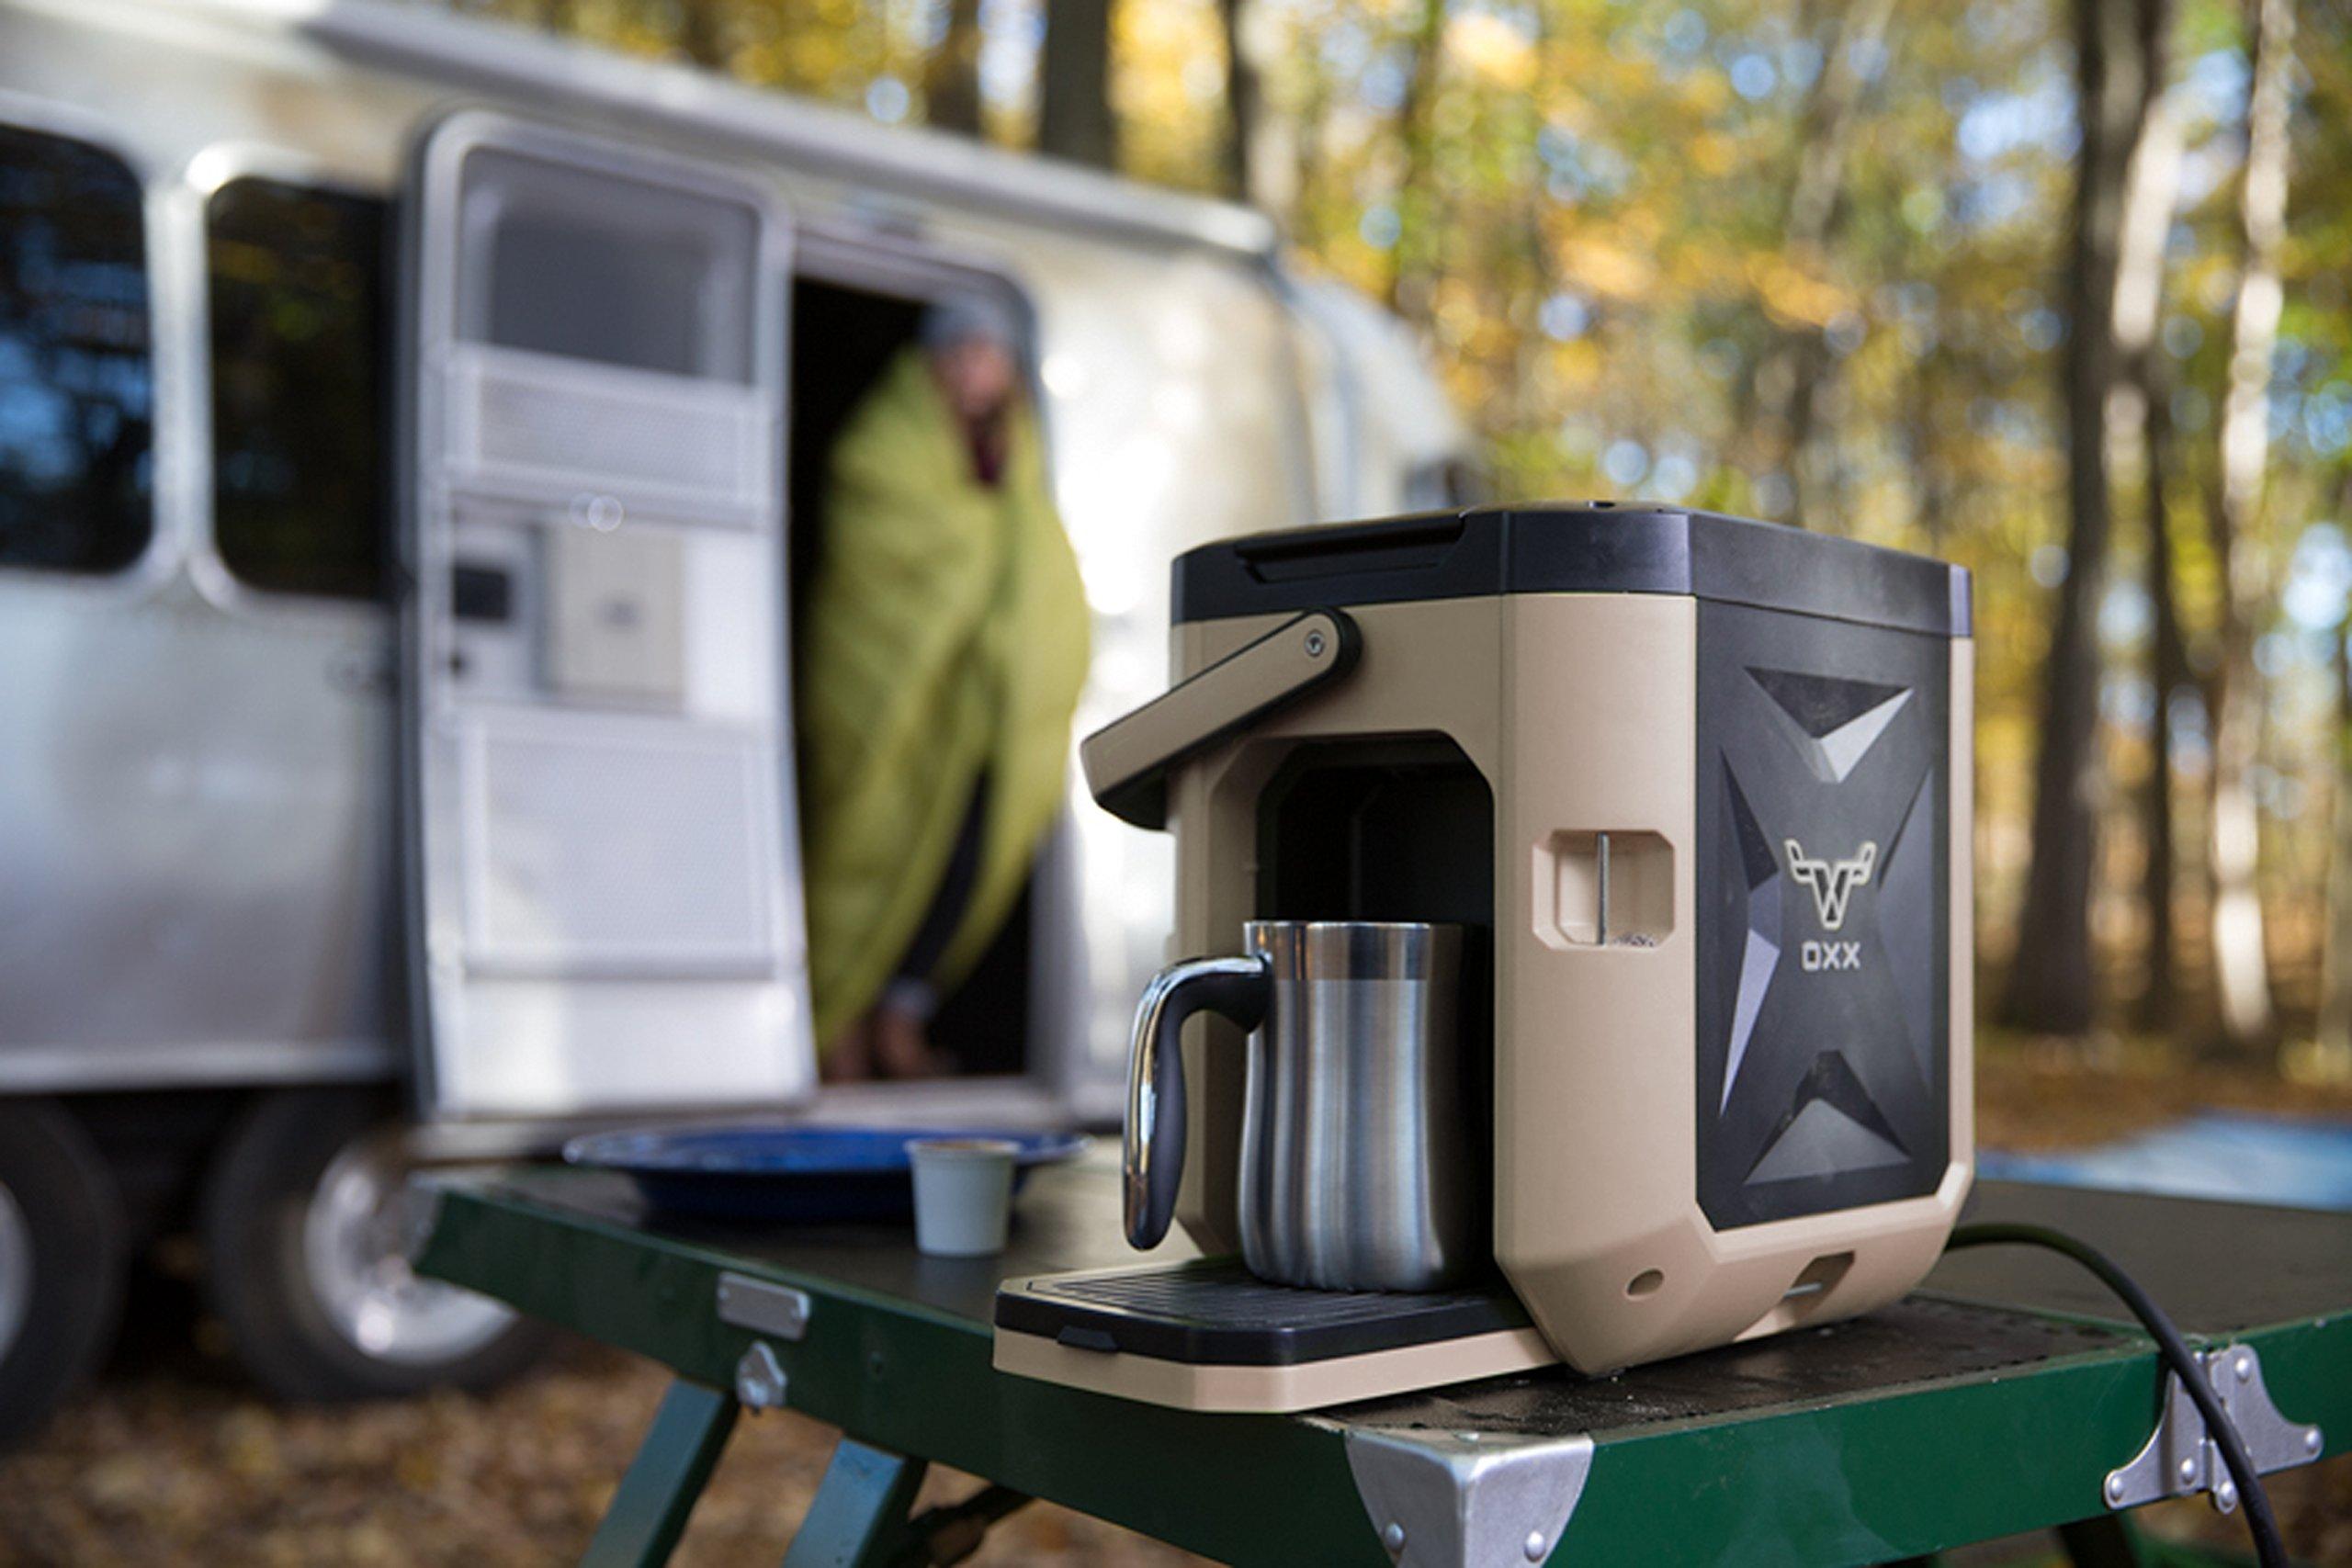 OXX COFFEEBOXX Job Site Single Serve Coffee Maker, Desert Tan by Oxx Inc (Image #6)